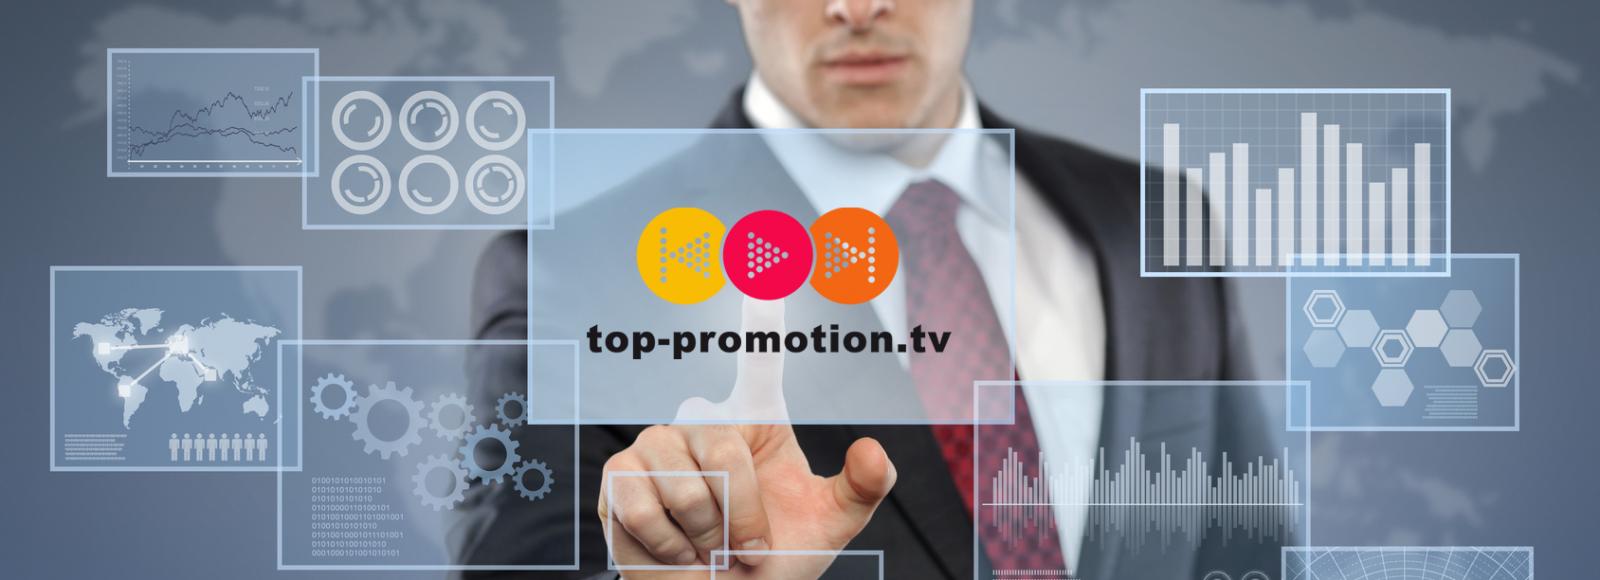 Startseite_Top_Promotion